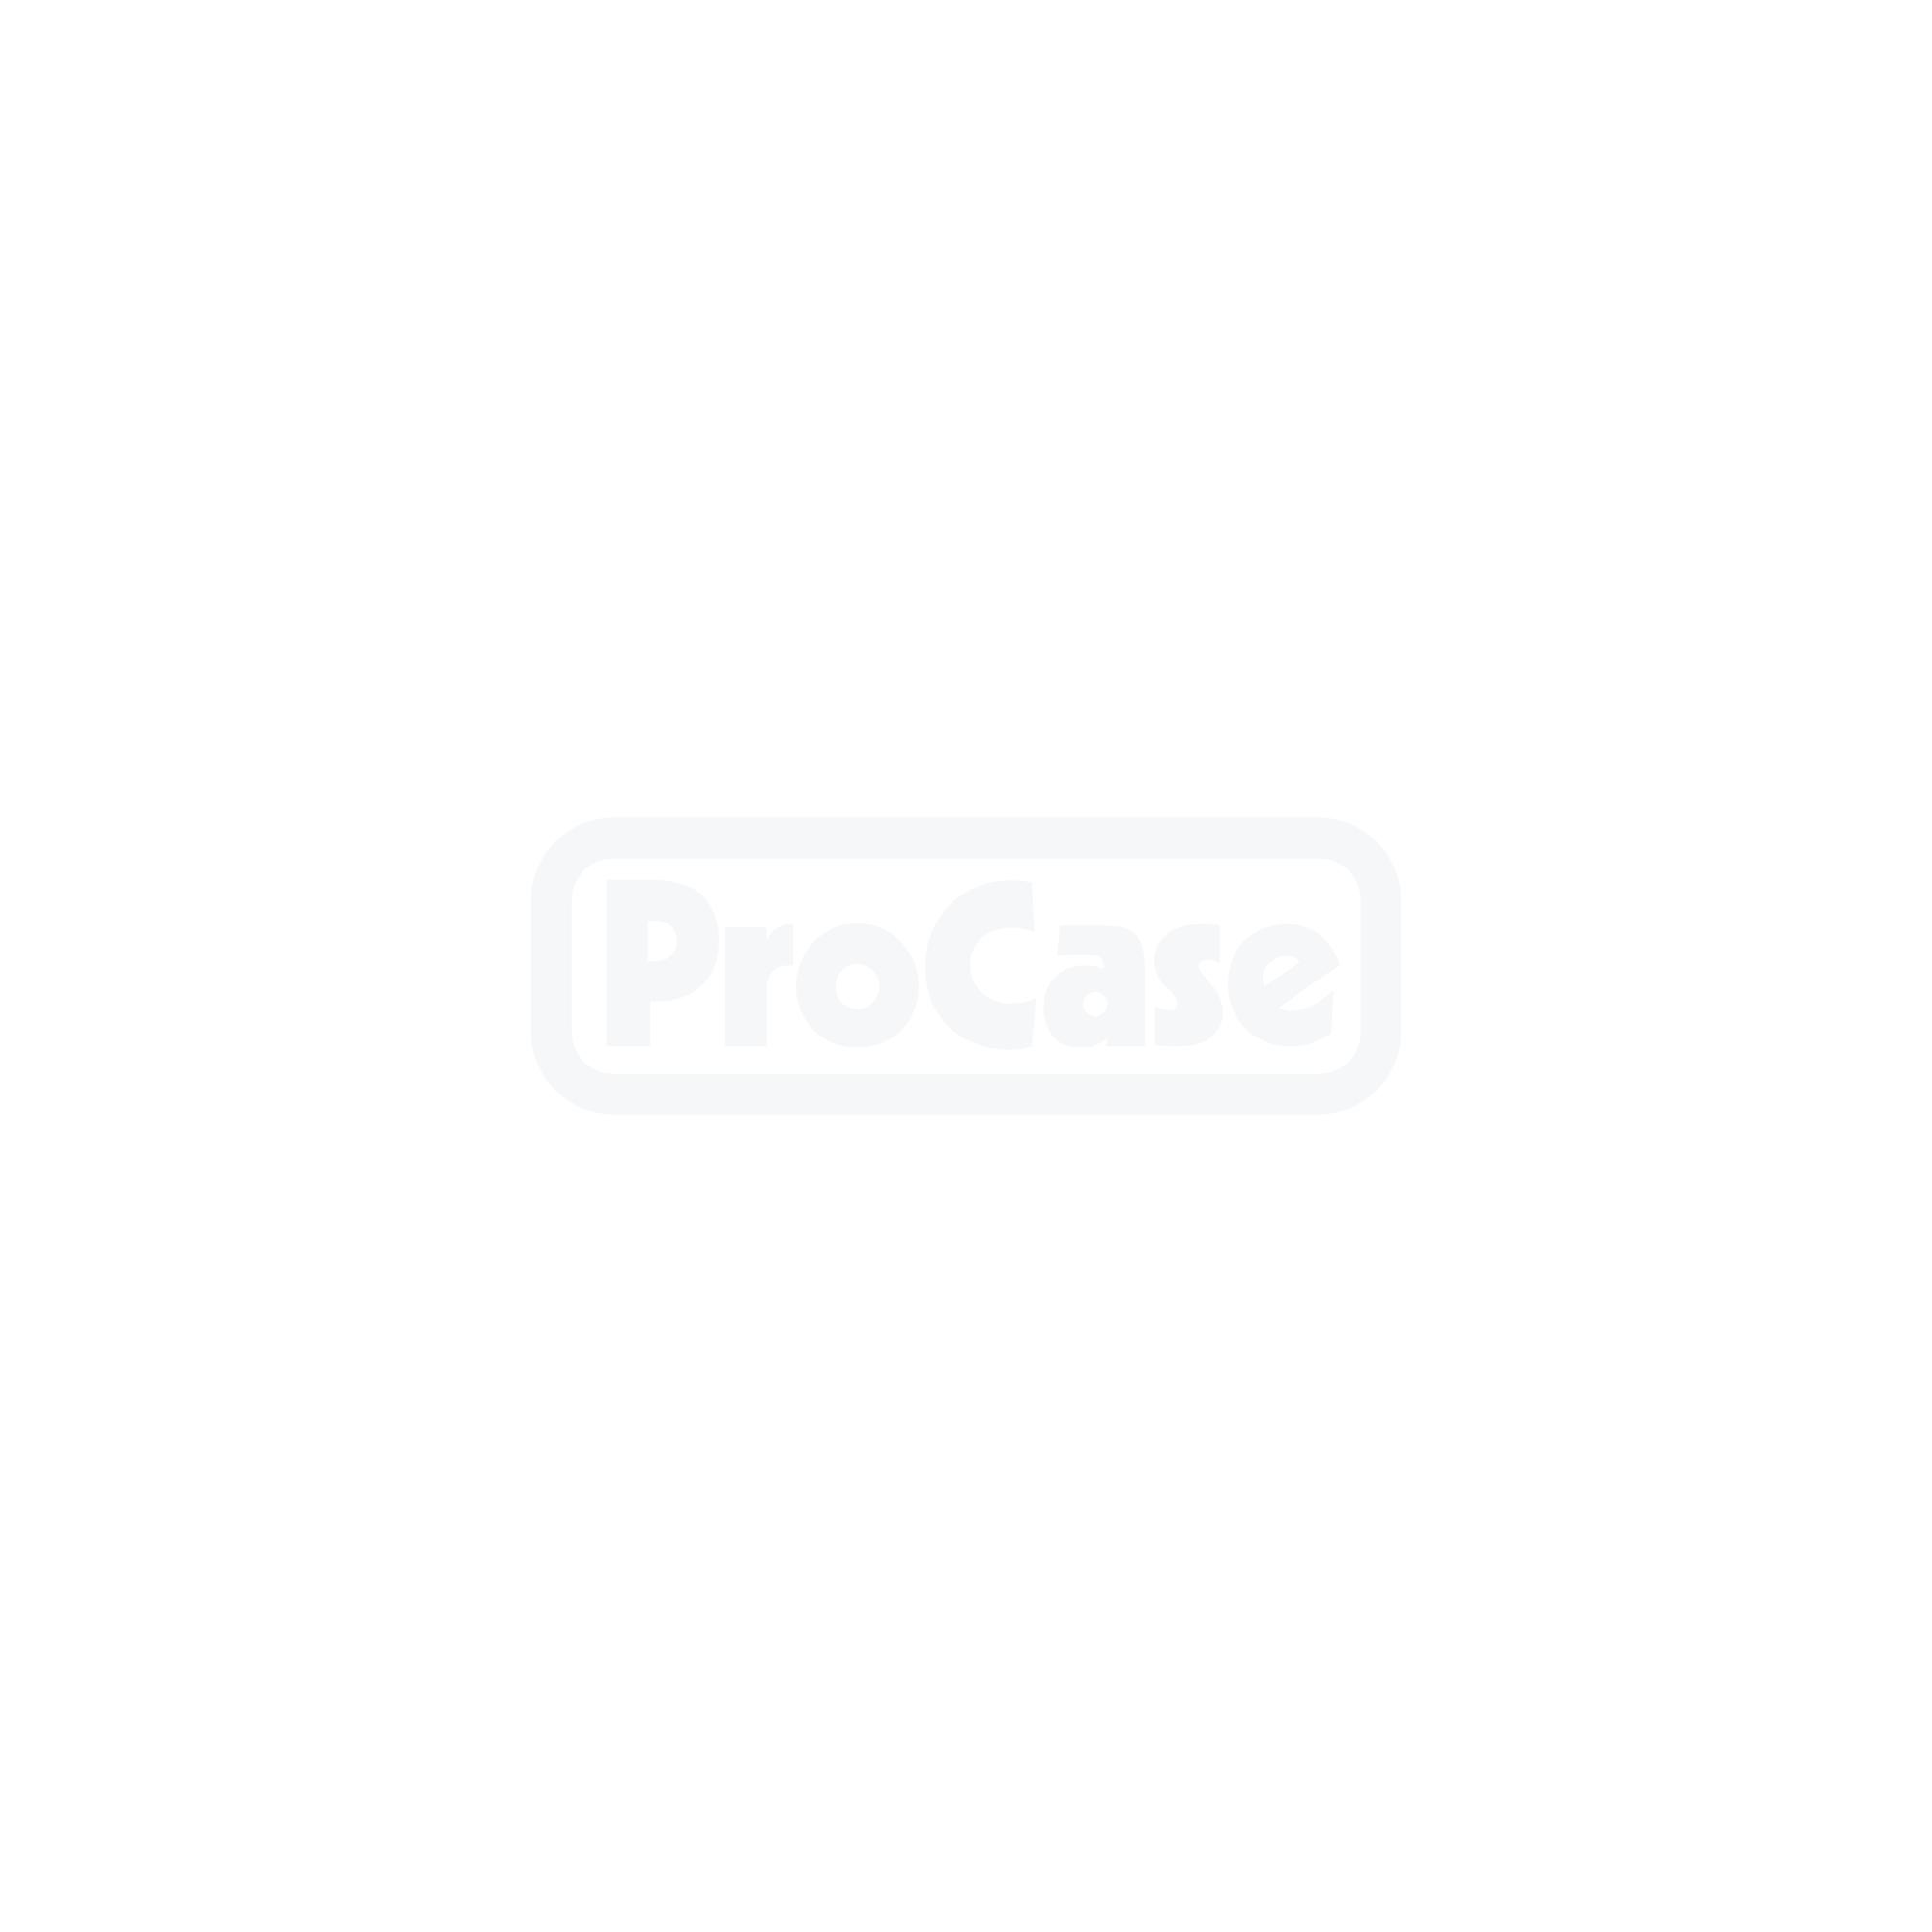 DJ-Konsole für Traktor Kontrol S4 MK2